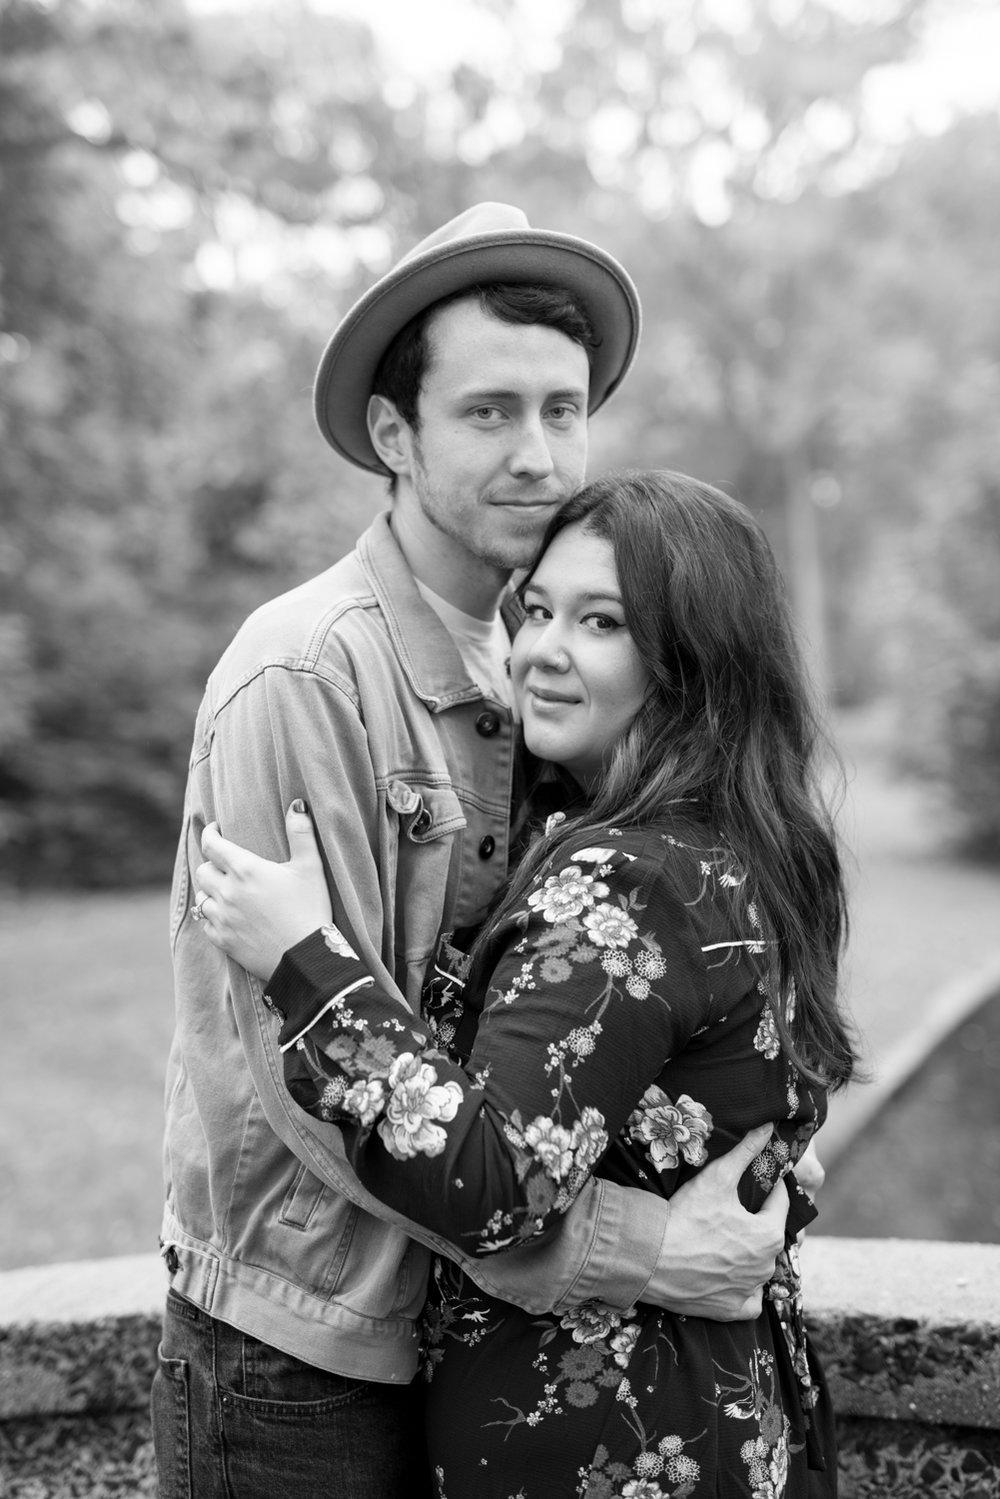 Mariangel+Kieran- Mindowaskin Park Engagement Session- Westfield New Jersey- Olivia Christina Photo-45.JPG